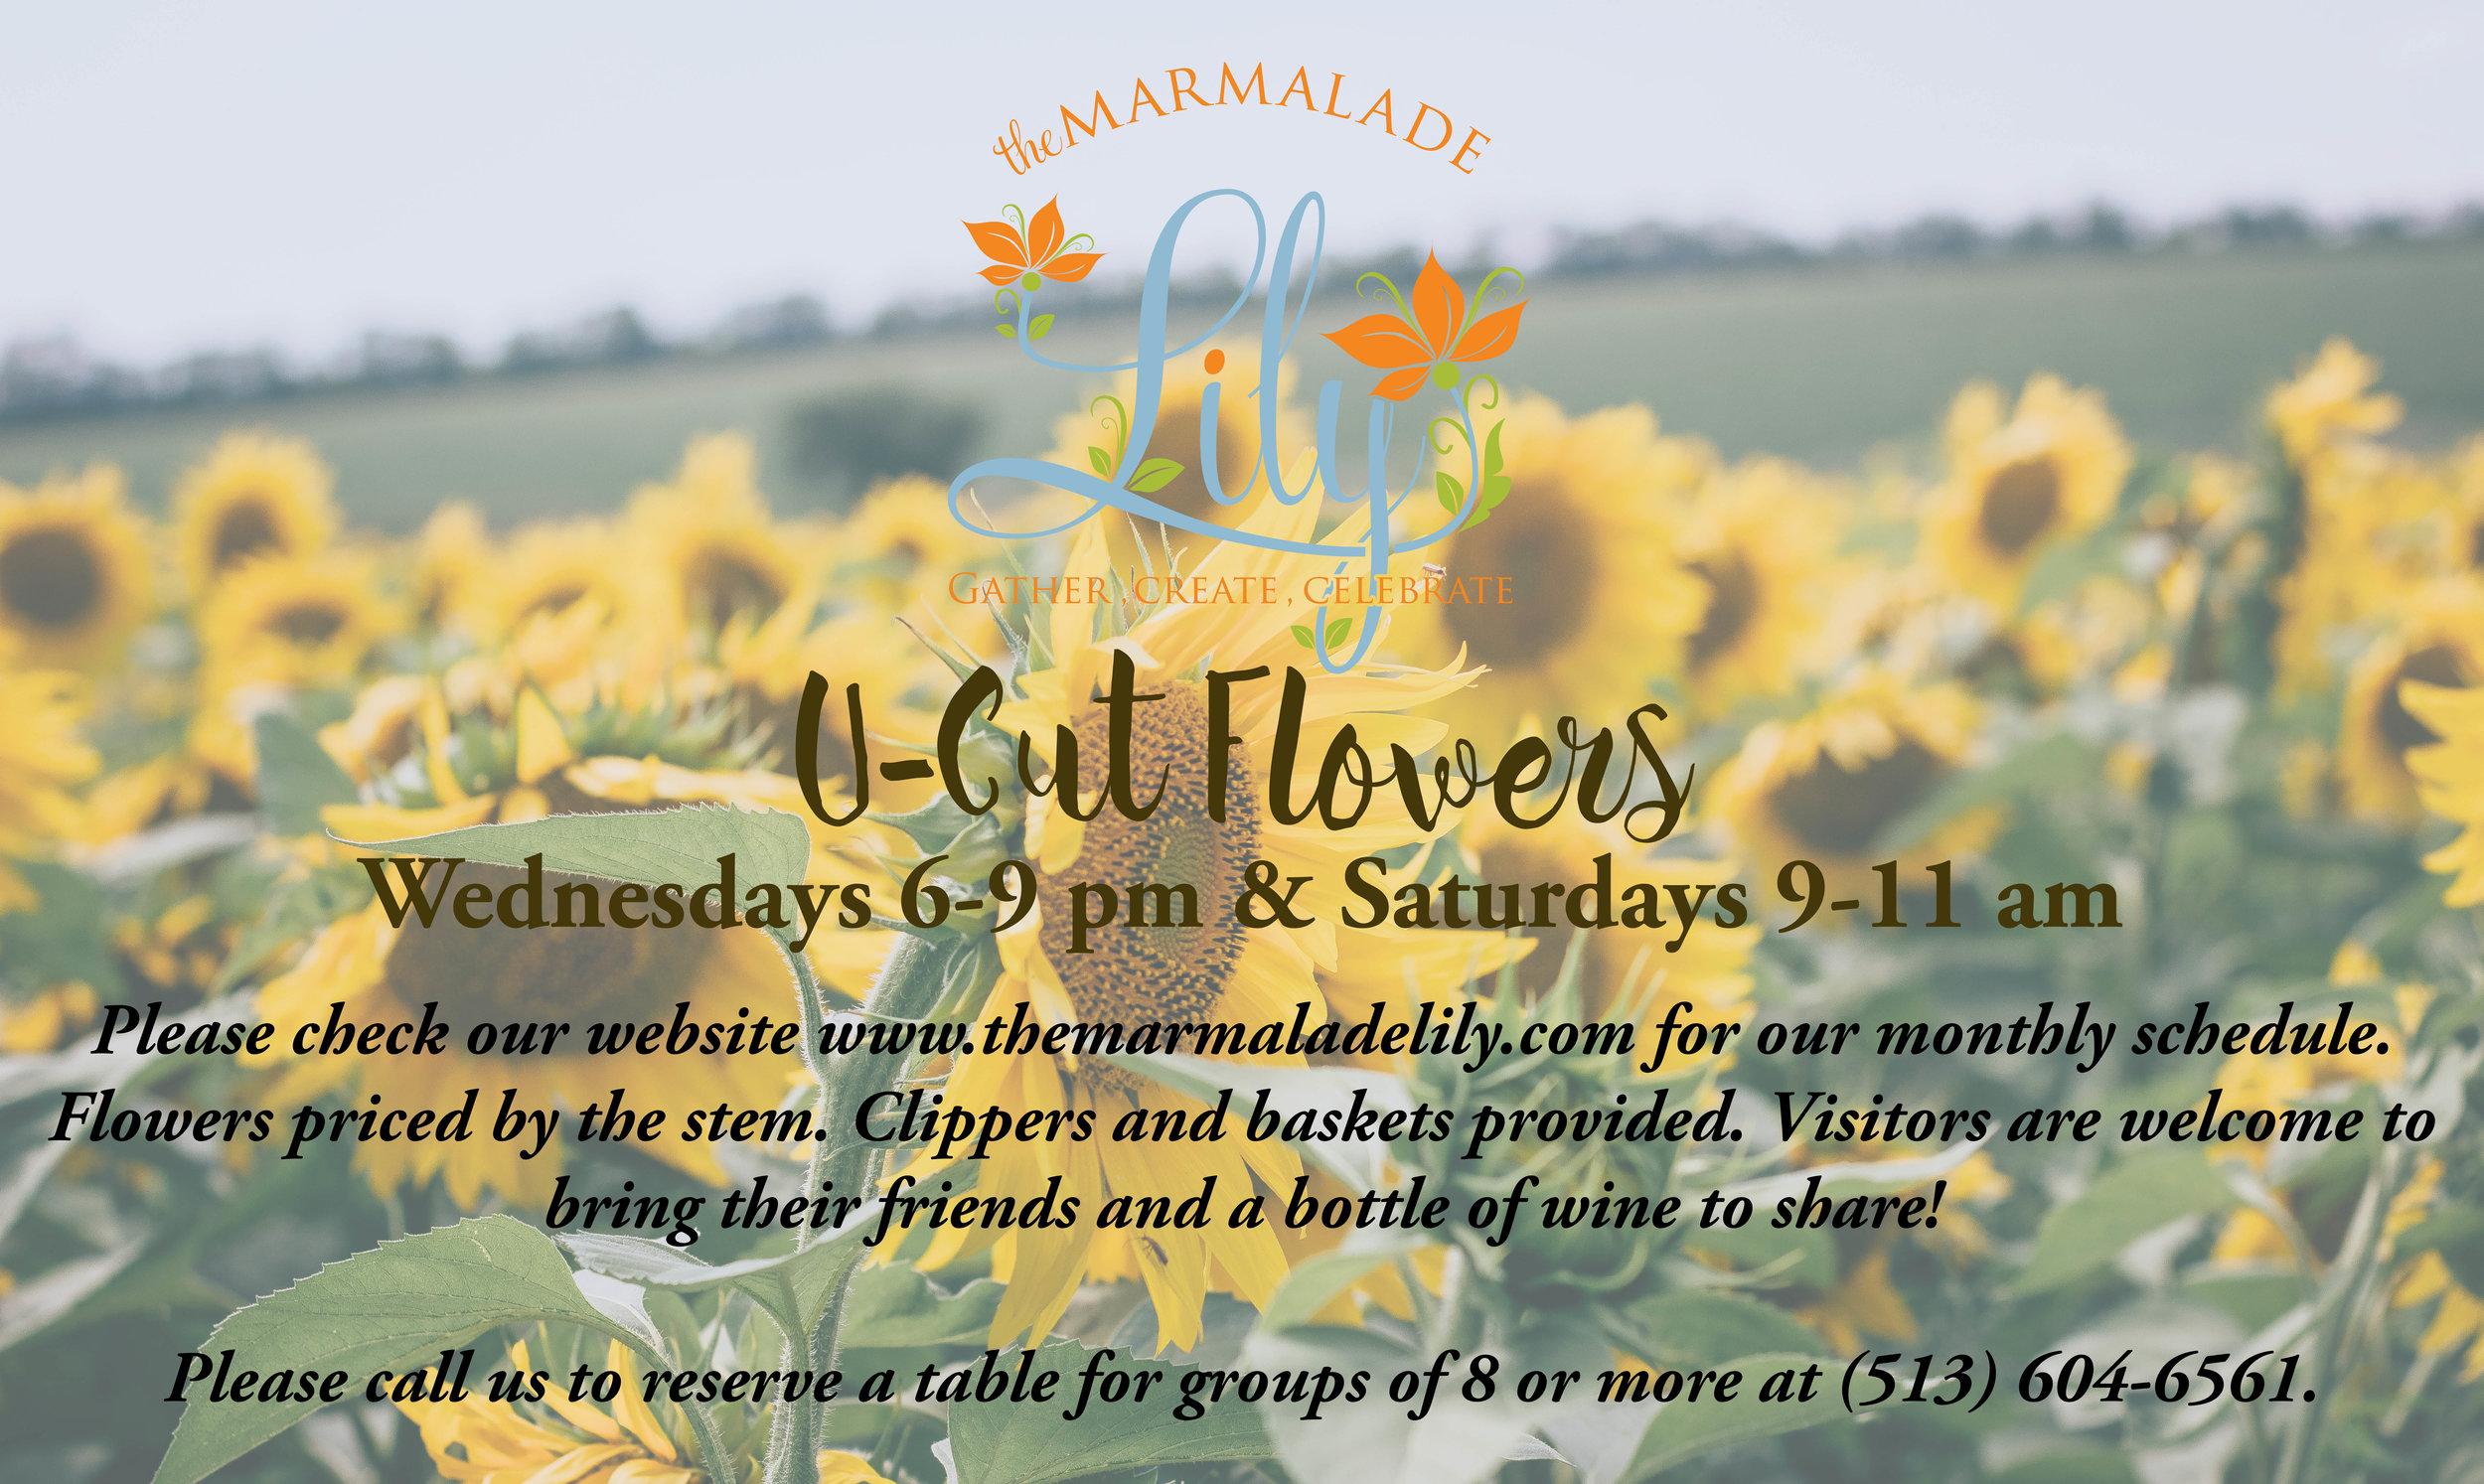 U-Cut Flower The Marmalade Lily Cincinnati, OH